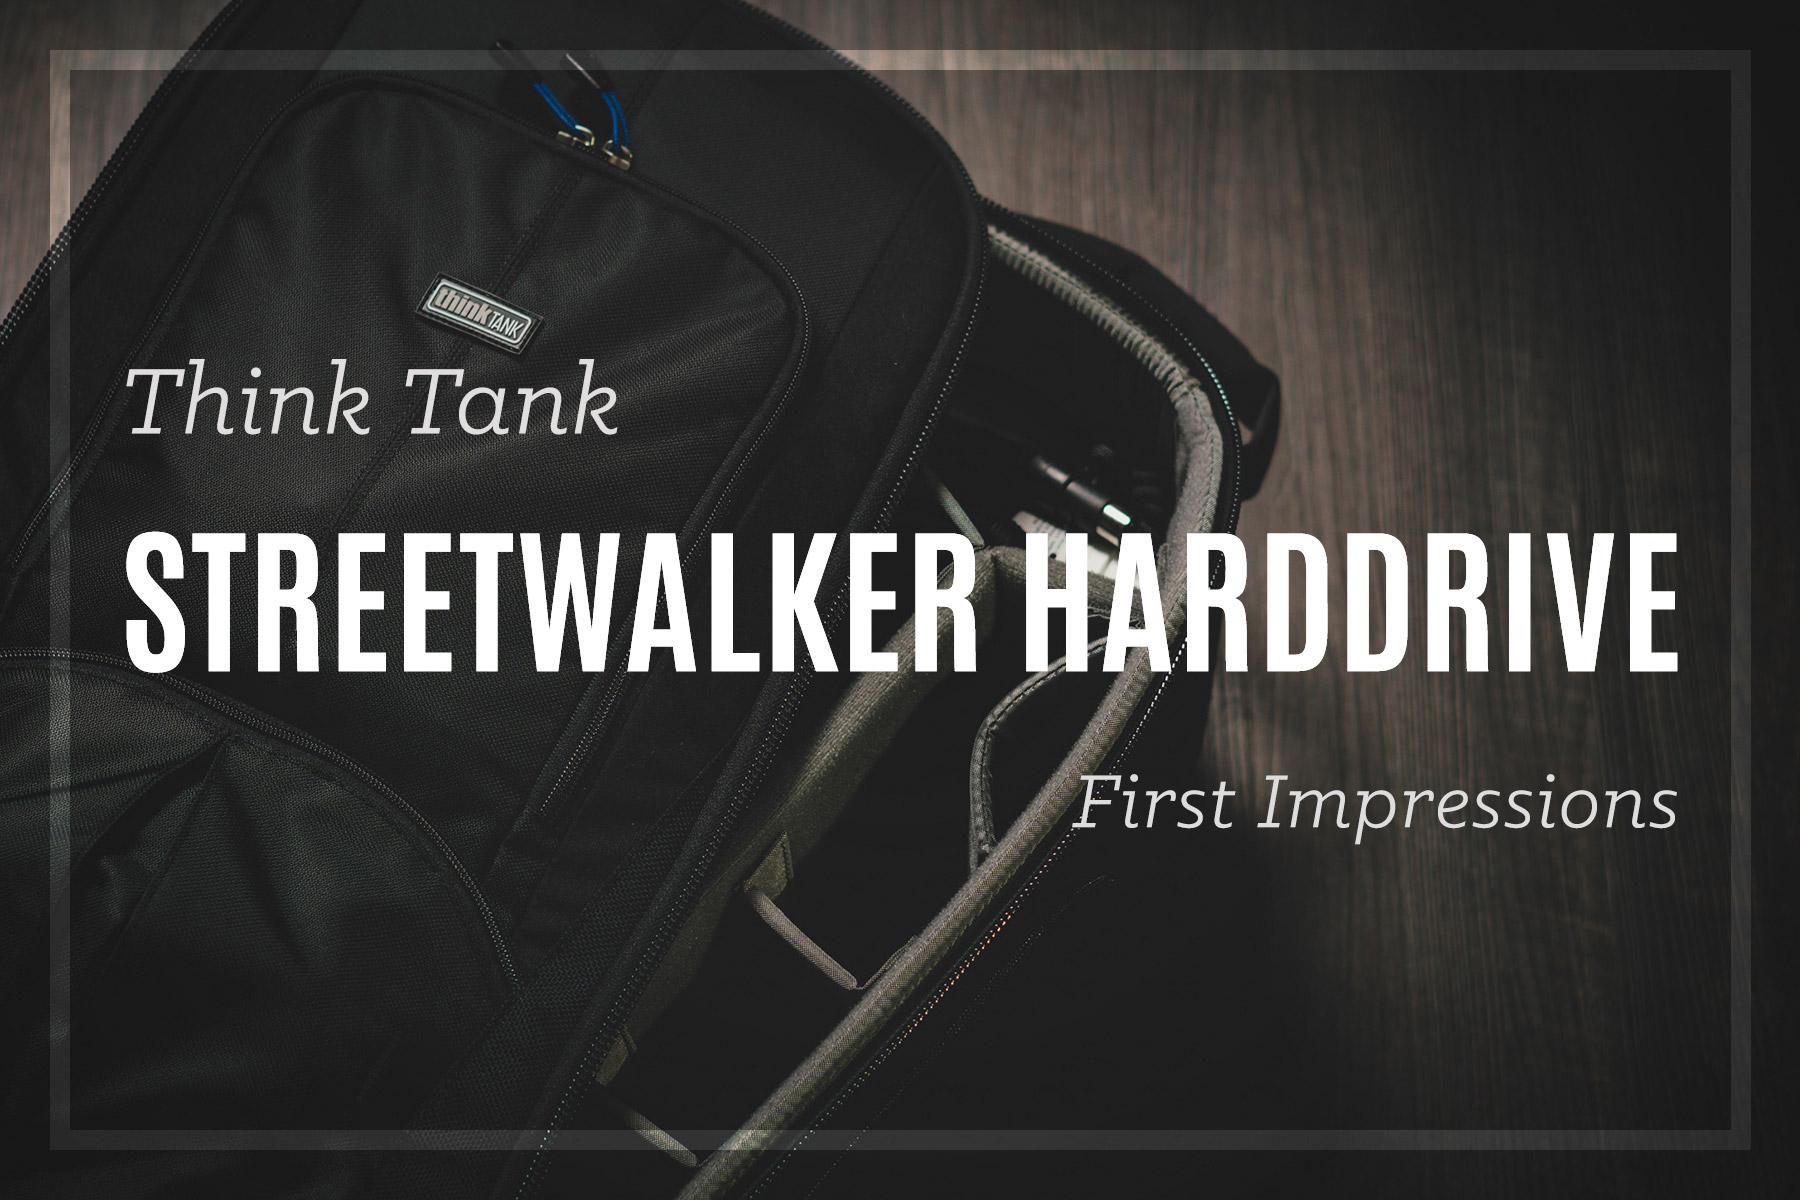 Think Tank Streetwalker Harddrive Review